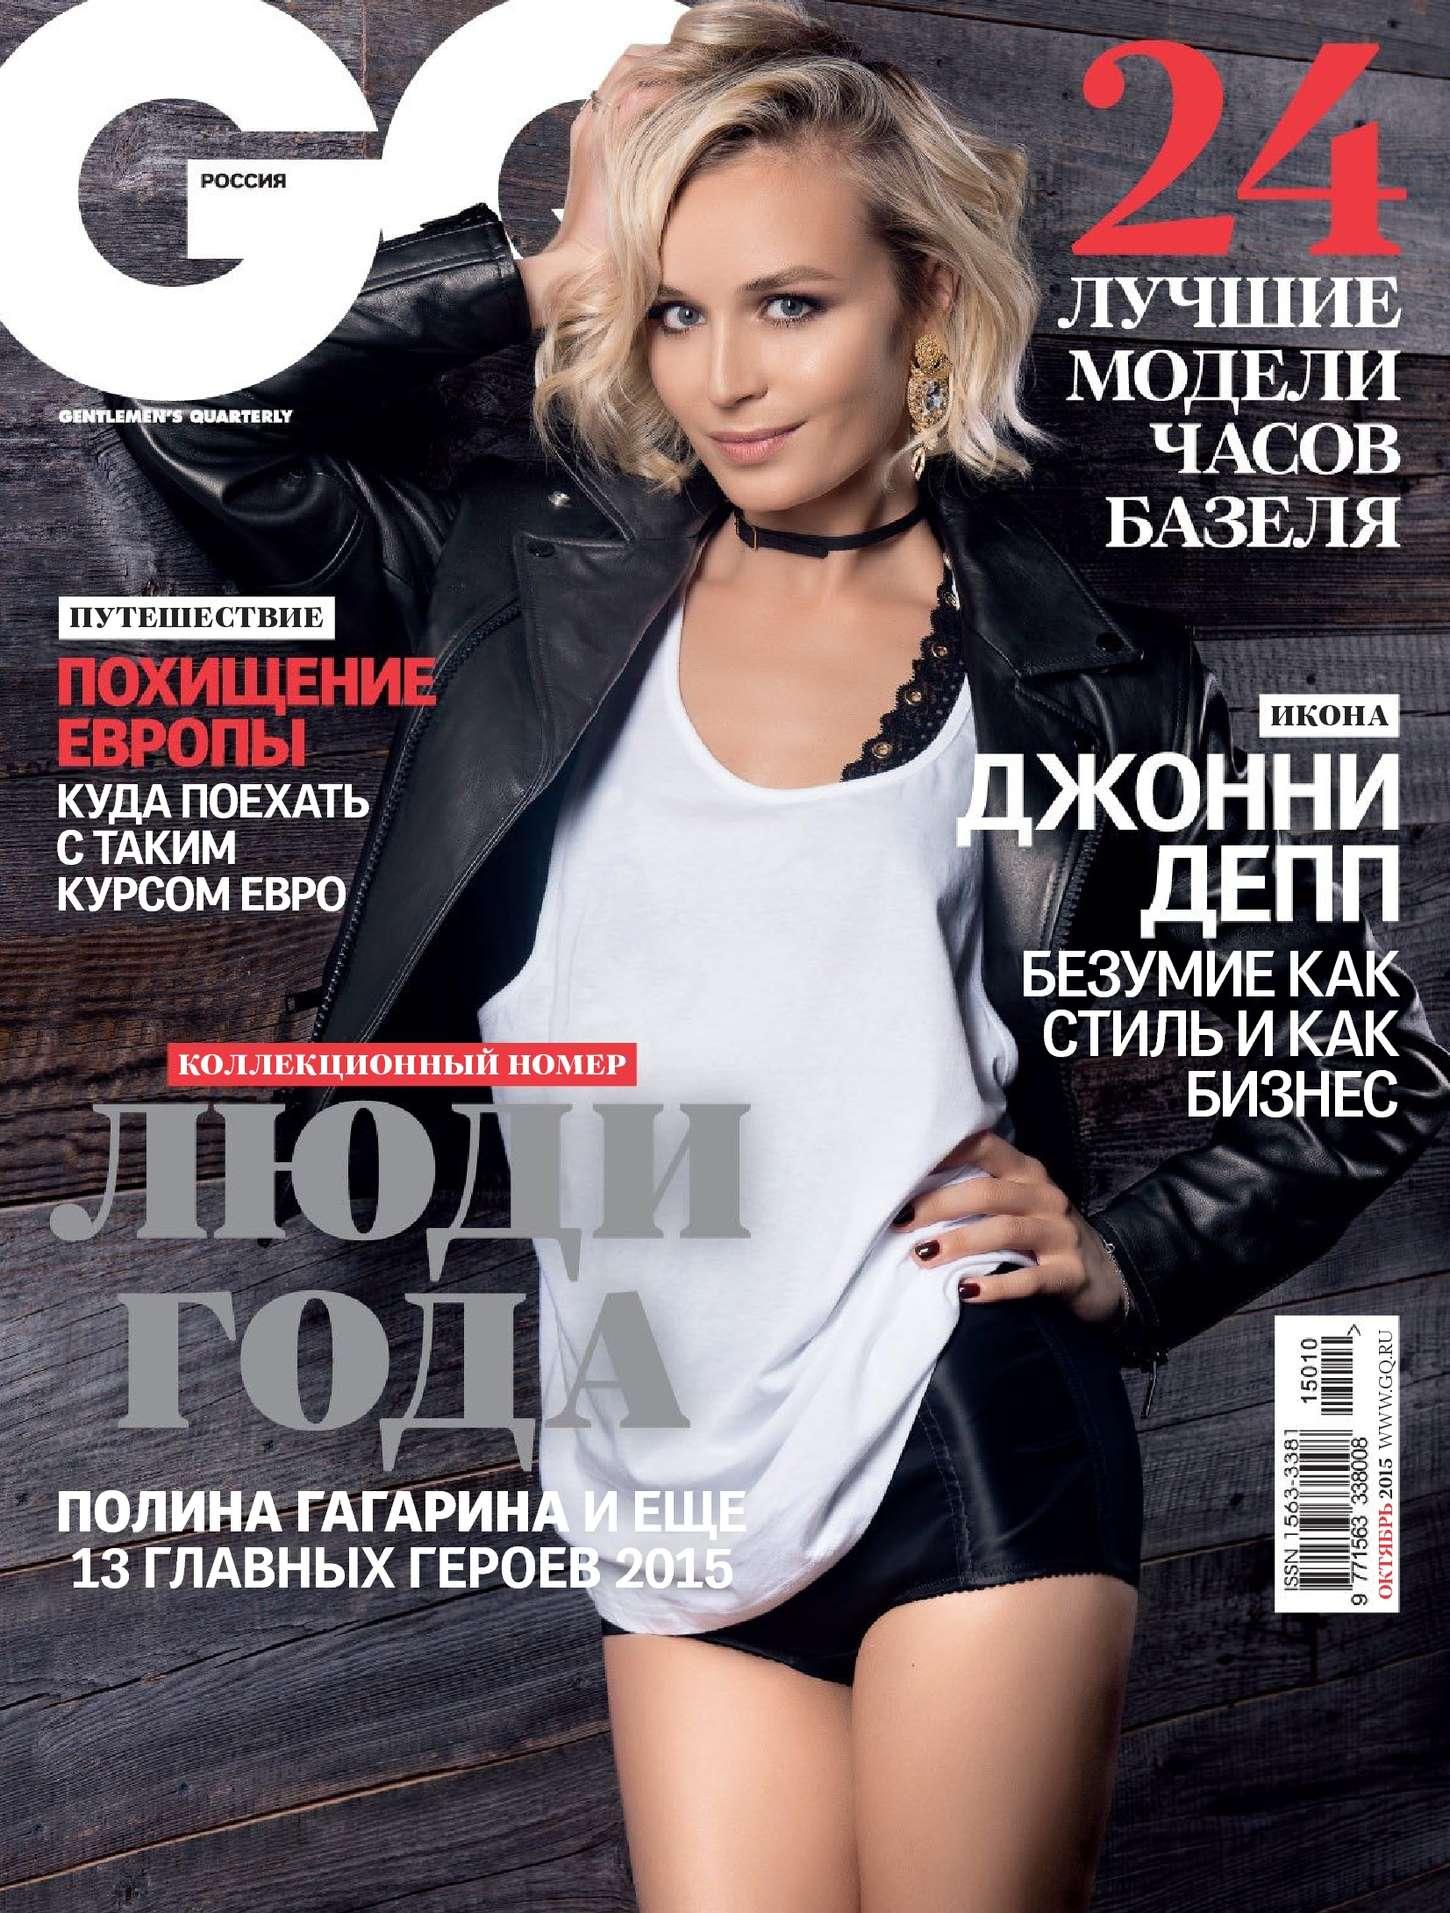 Голая Вера Брежнева в журналах XXL, Maxim, на сцене, фото ...